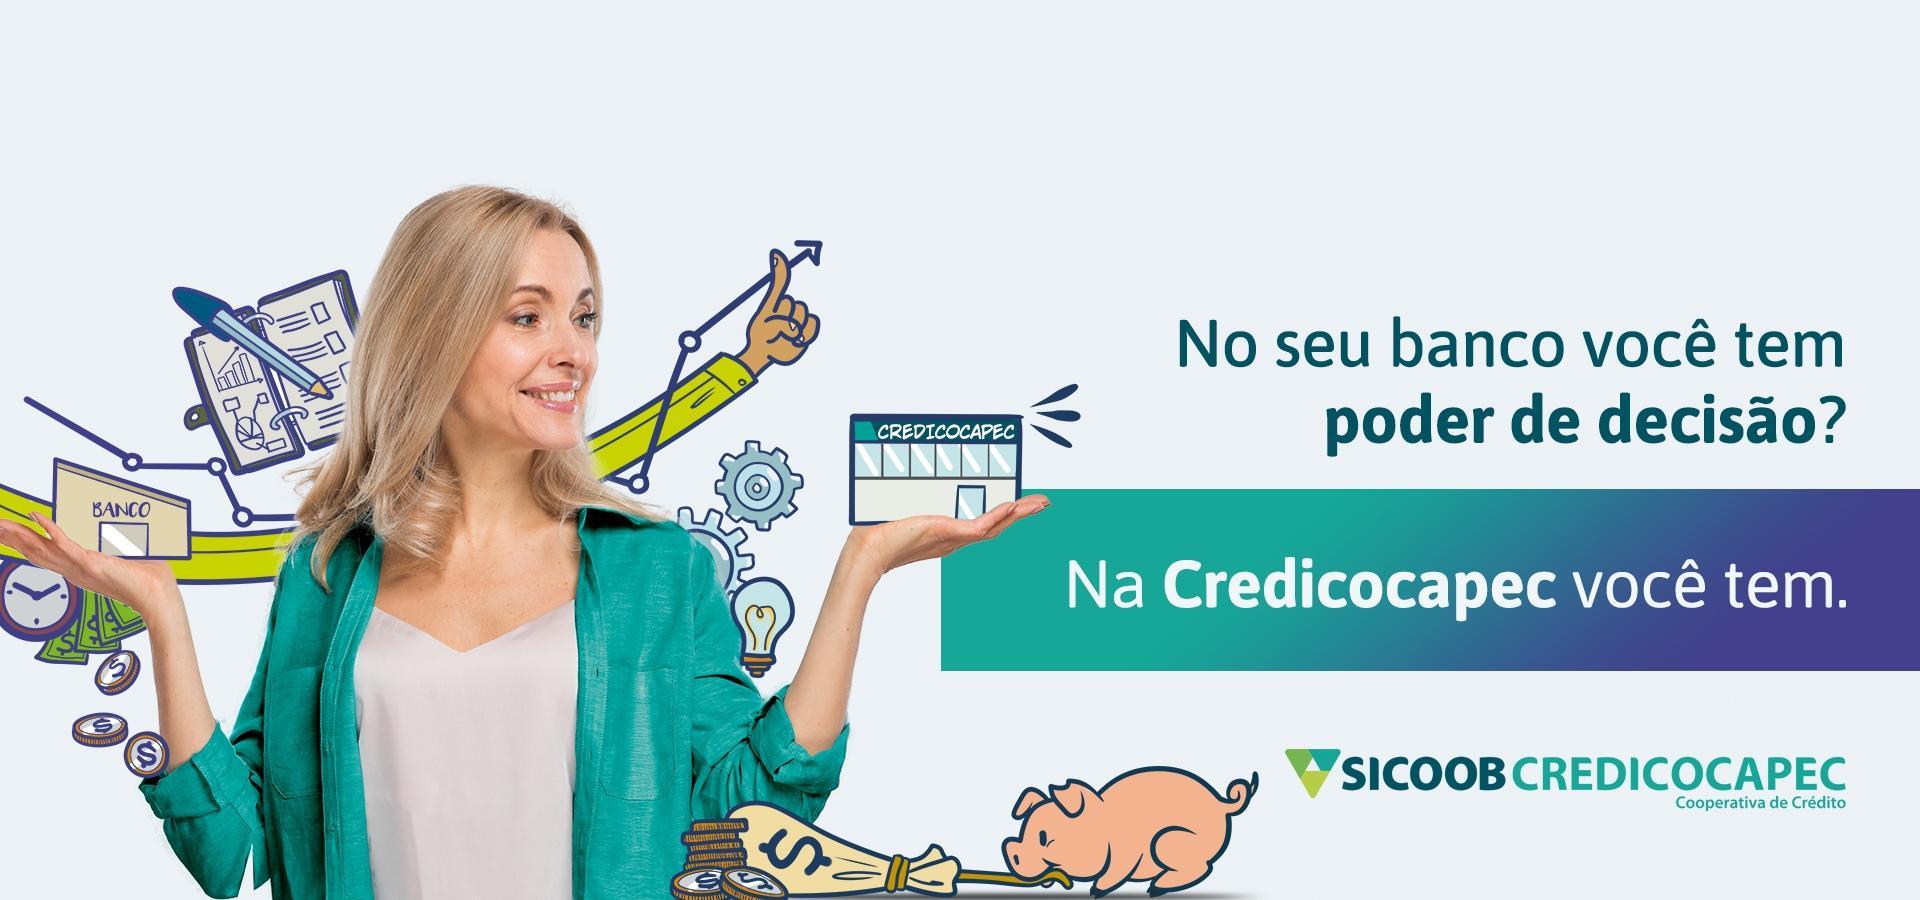 Sicoob Credicocapec